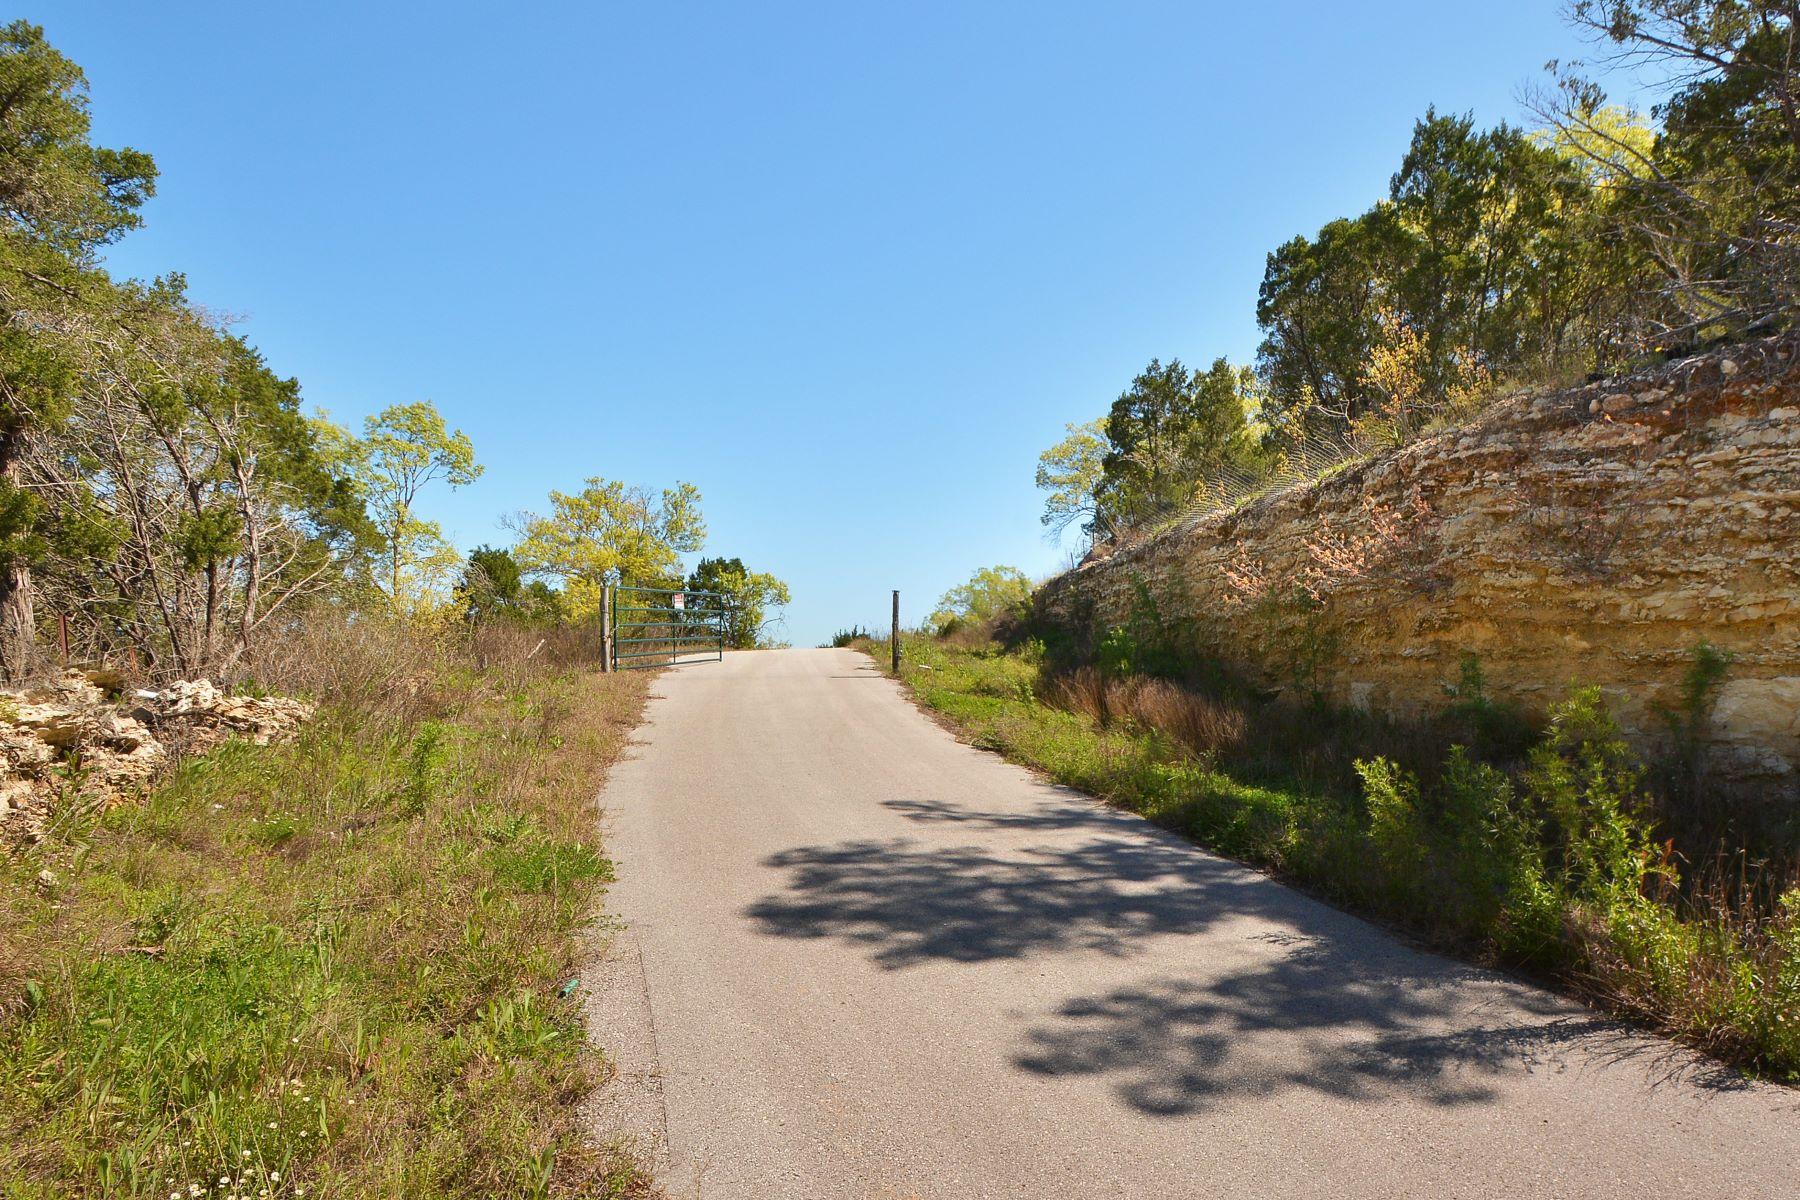 Additional photo for property listing at 50 Mile Panoramic Views 8718 Southwest Pkwy 1 & 2 Austin, Texas 78735 Estados Unidos